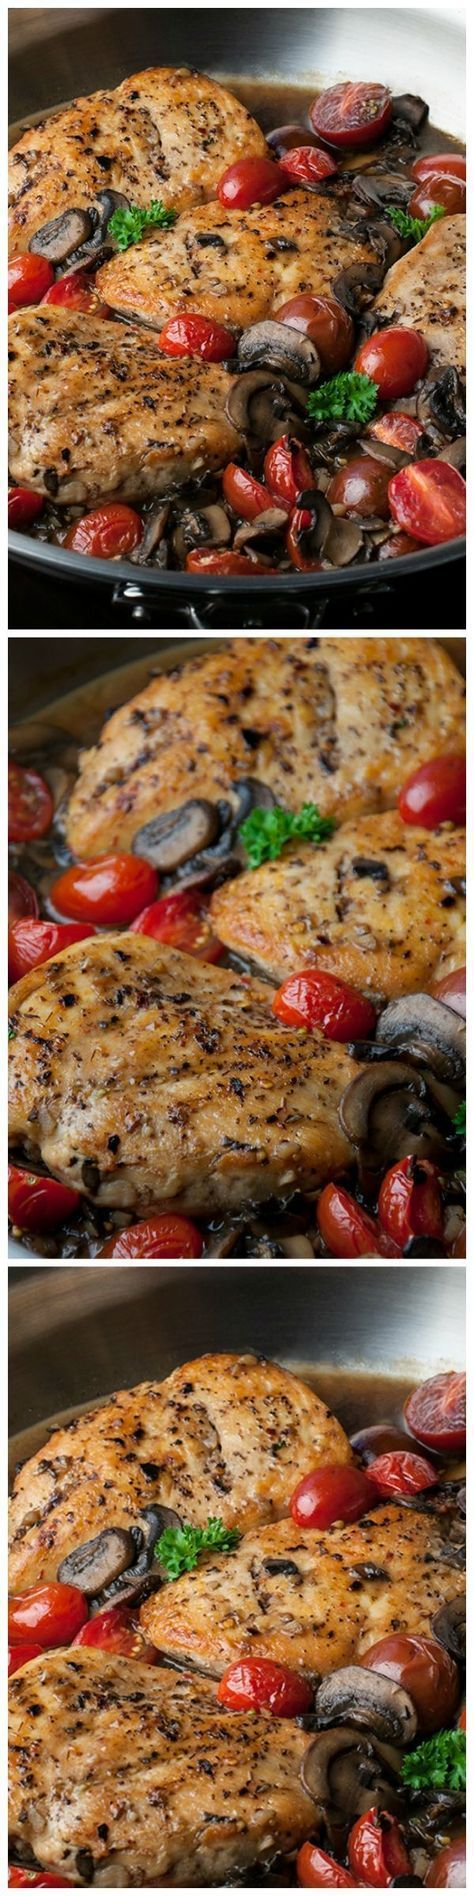 Skinny Chicken Marsala - A healthier and lighter version of chicken marsala, but every bit as tasty!